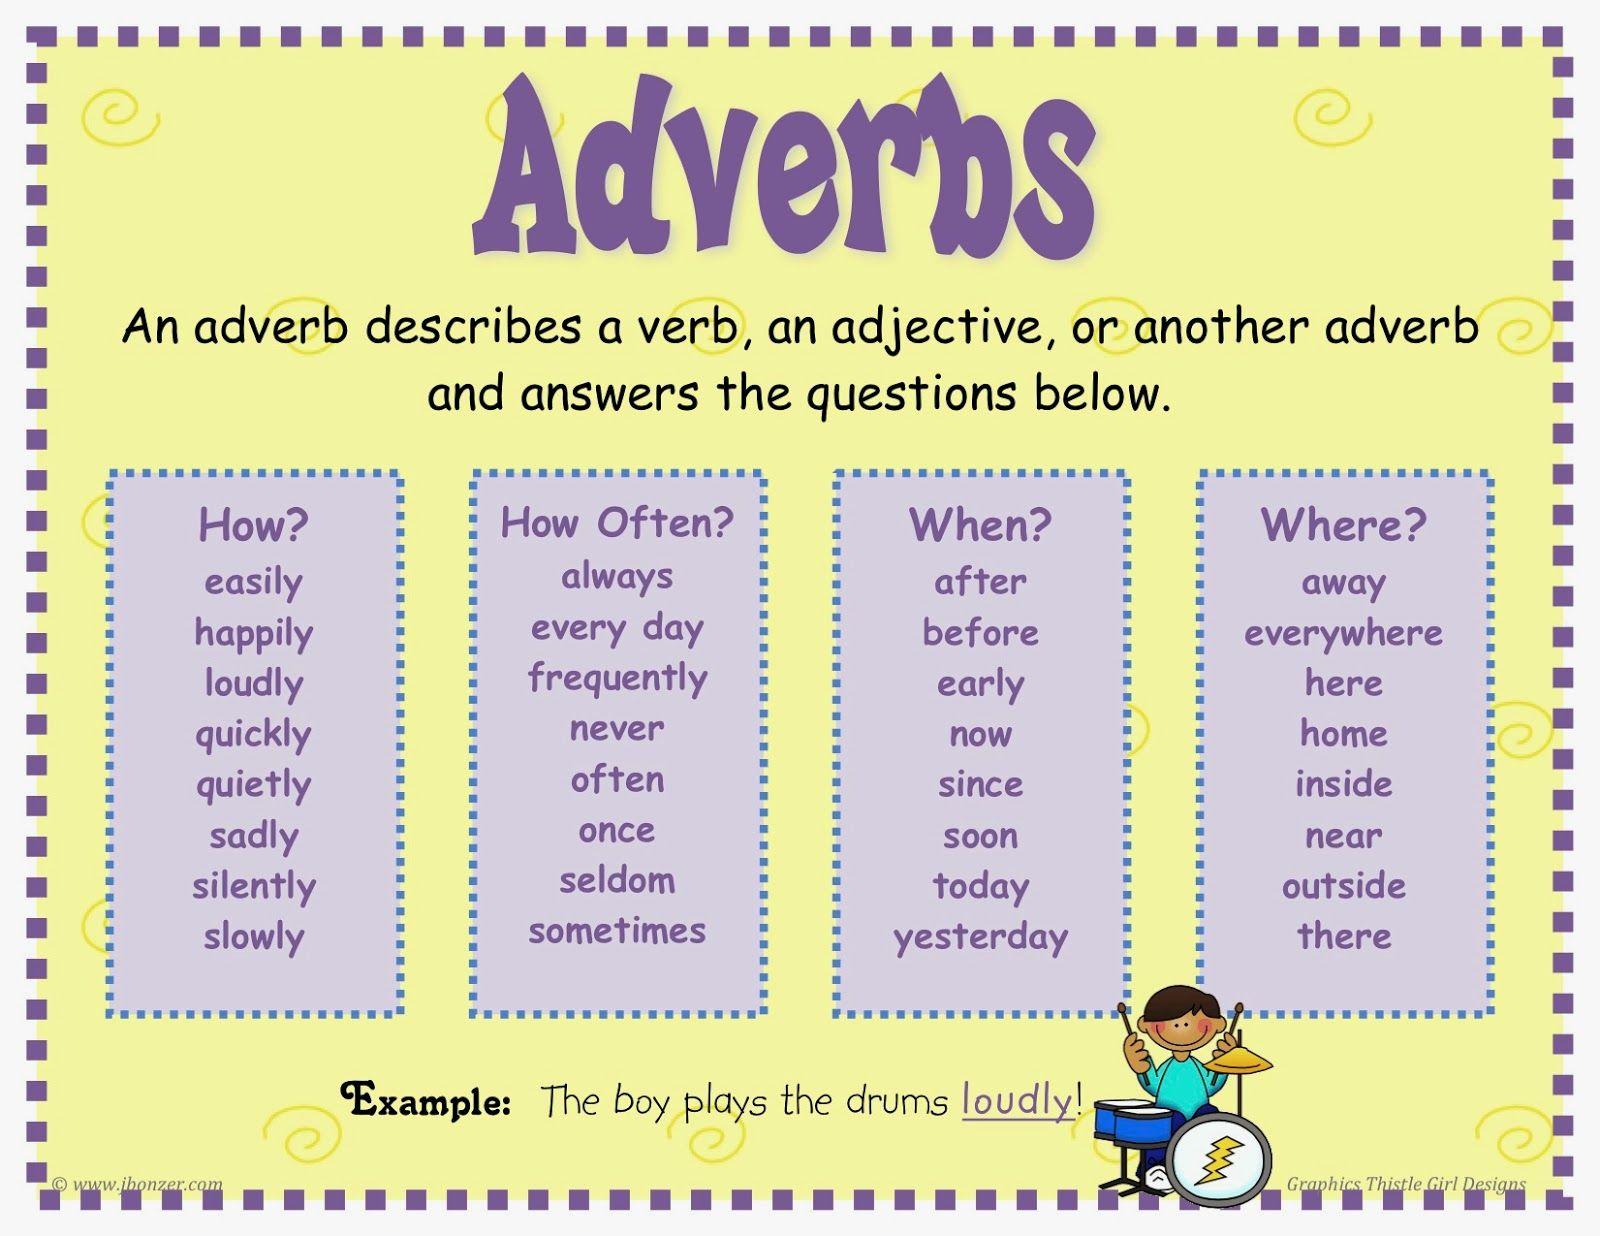 Adverbs, Free CTET Exam Notes, CBSE Notes, TET Practice